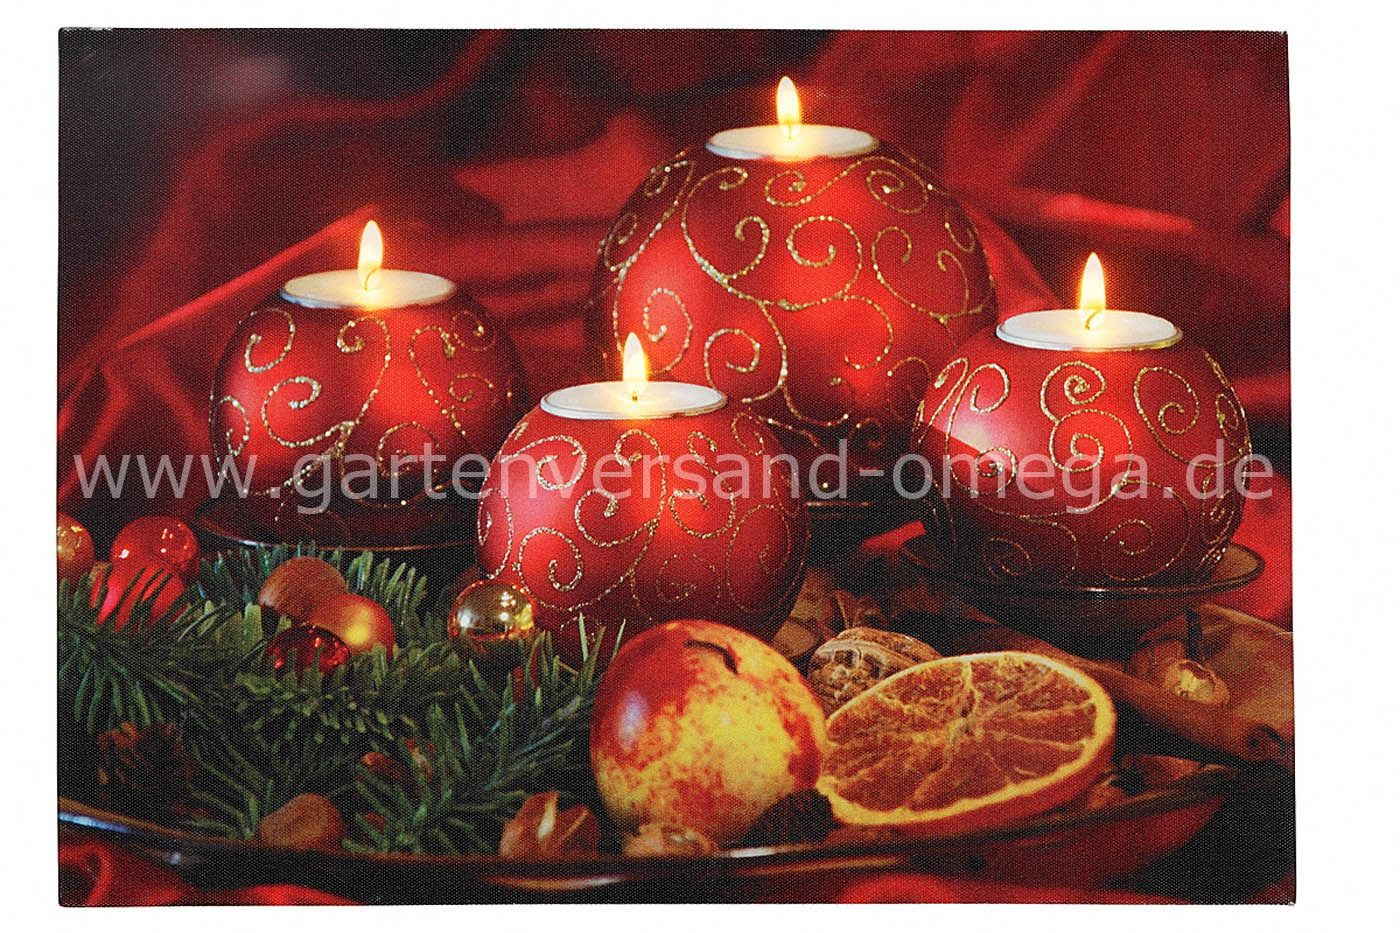 led bild motiv weihnachtskerzen weihnachtsbeleuchtung. Black Bedroom Furniture Sets. Home Design Ideas